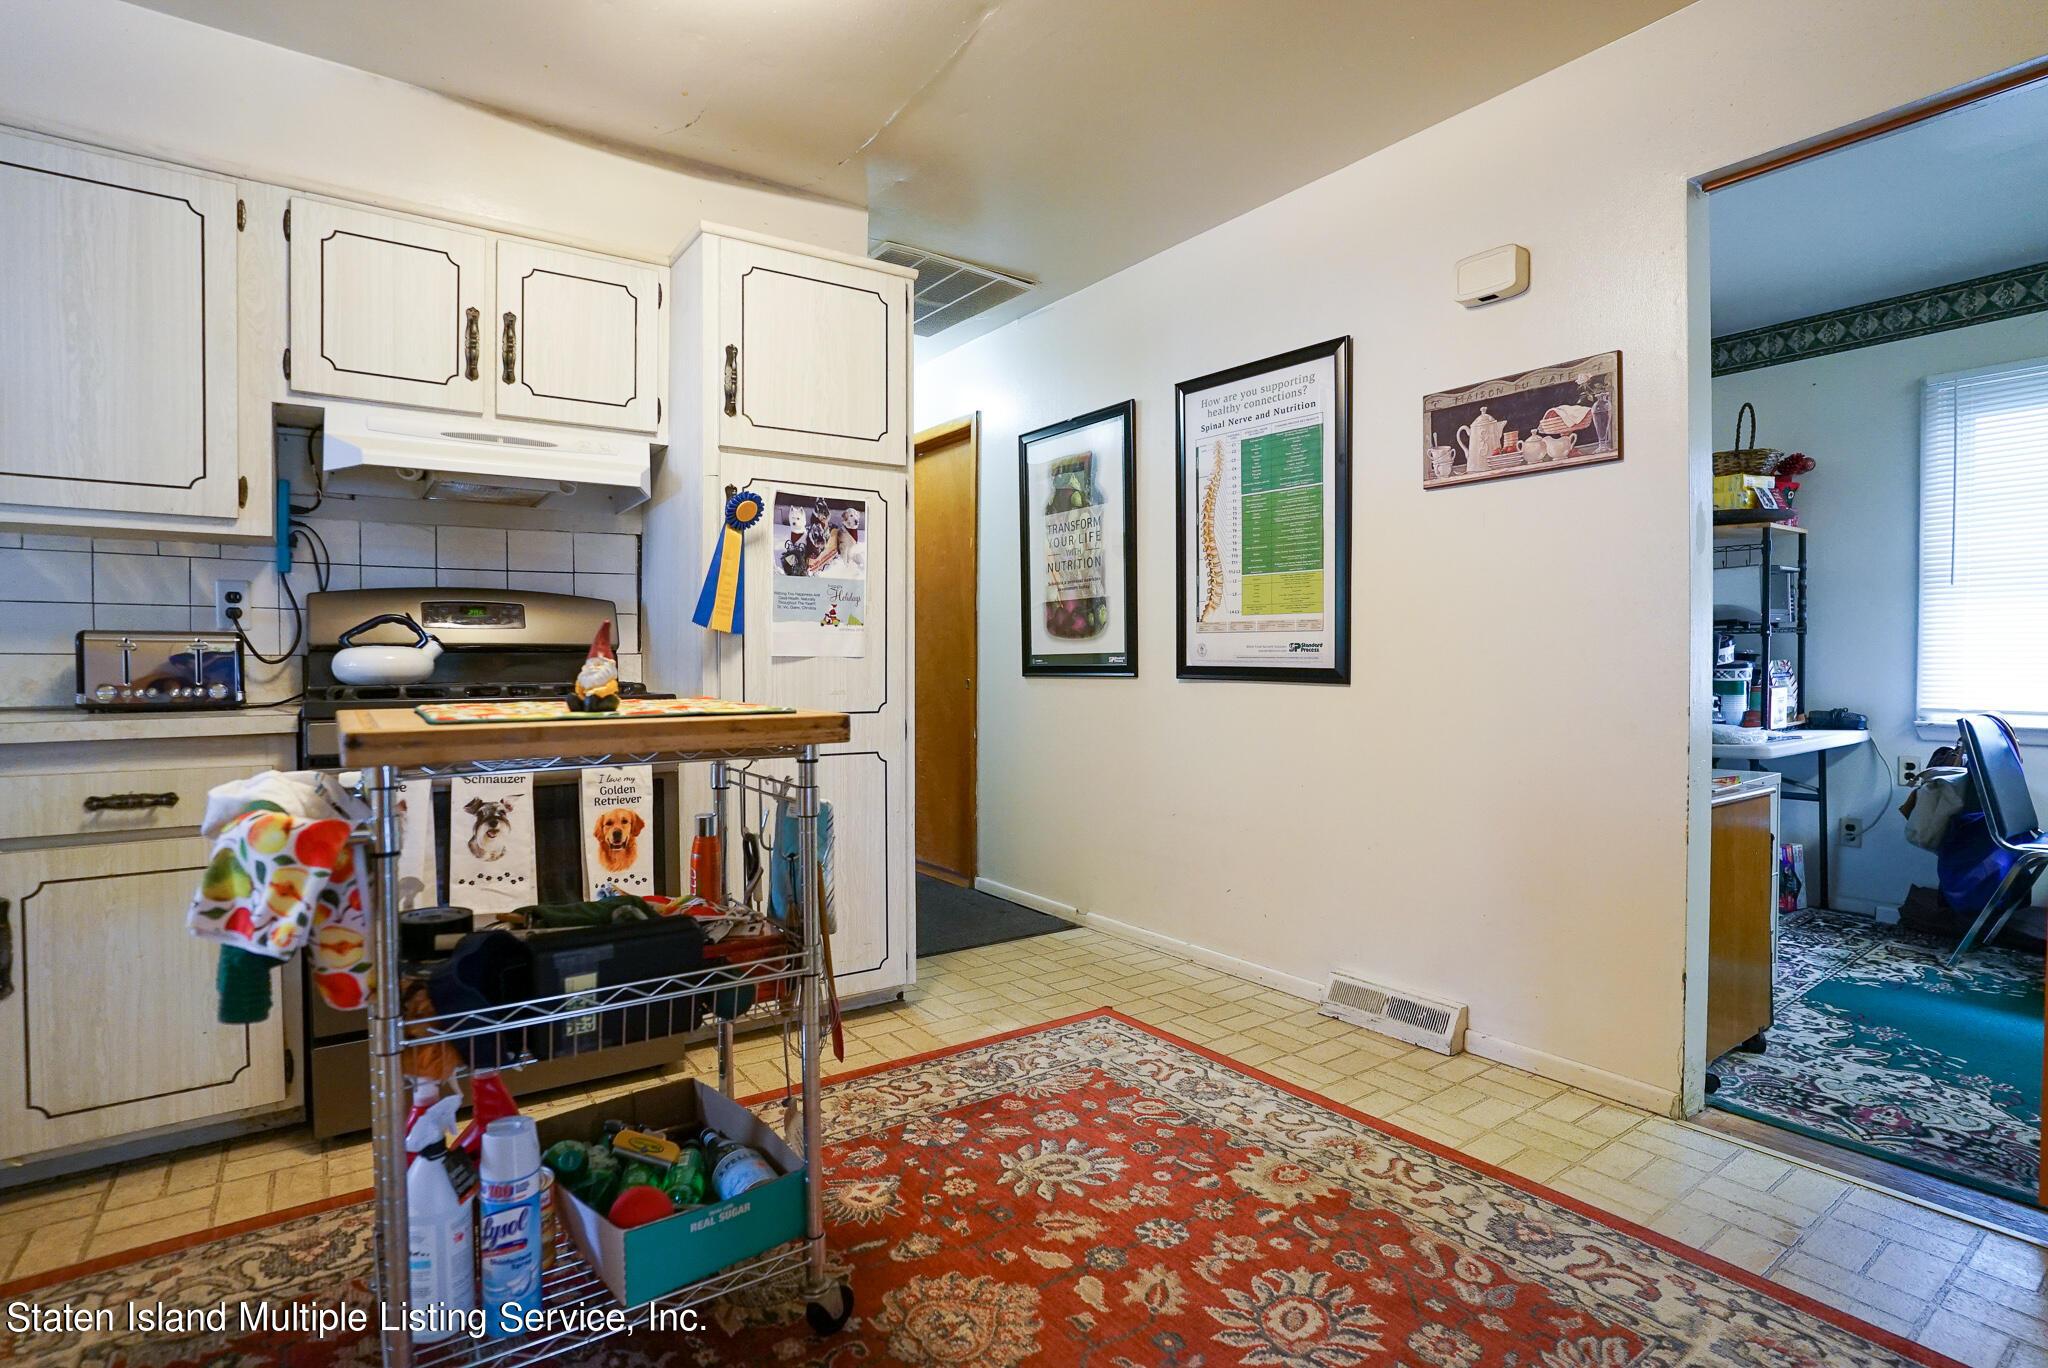 Single Family - Detached 121 Parkinson Avenue  Staten Island, NY 10305, MLS-1147747-12